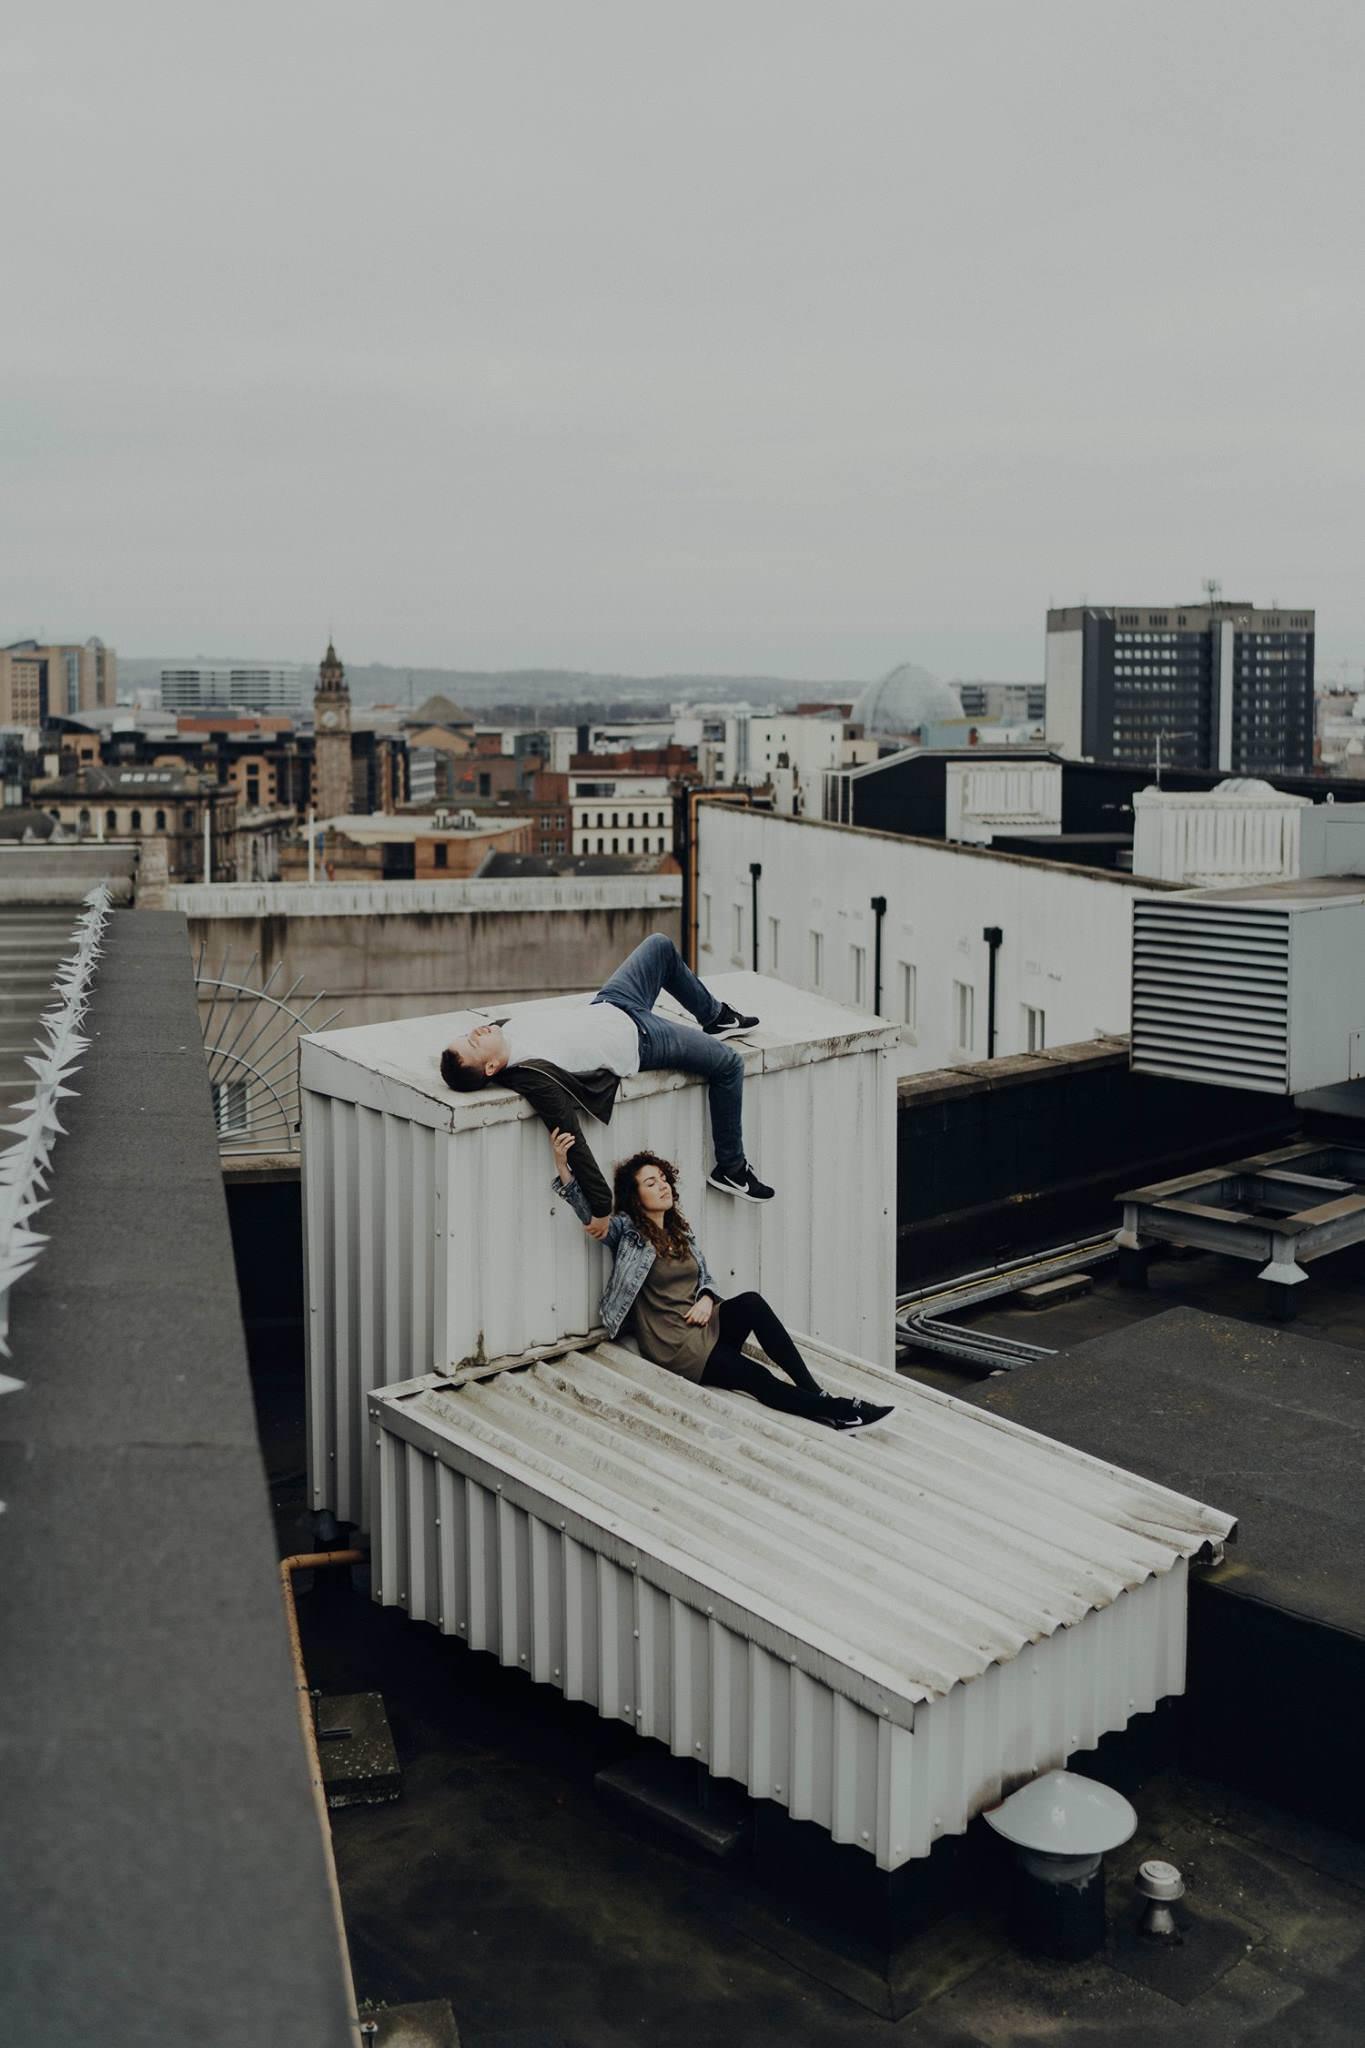 The Best Urban Photos On LLF